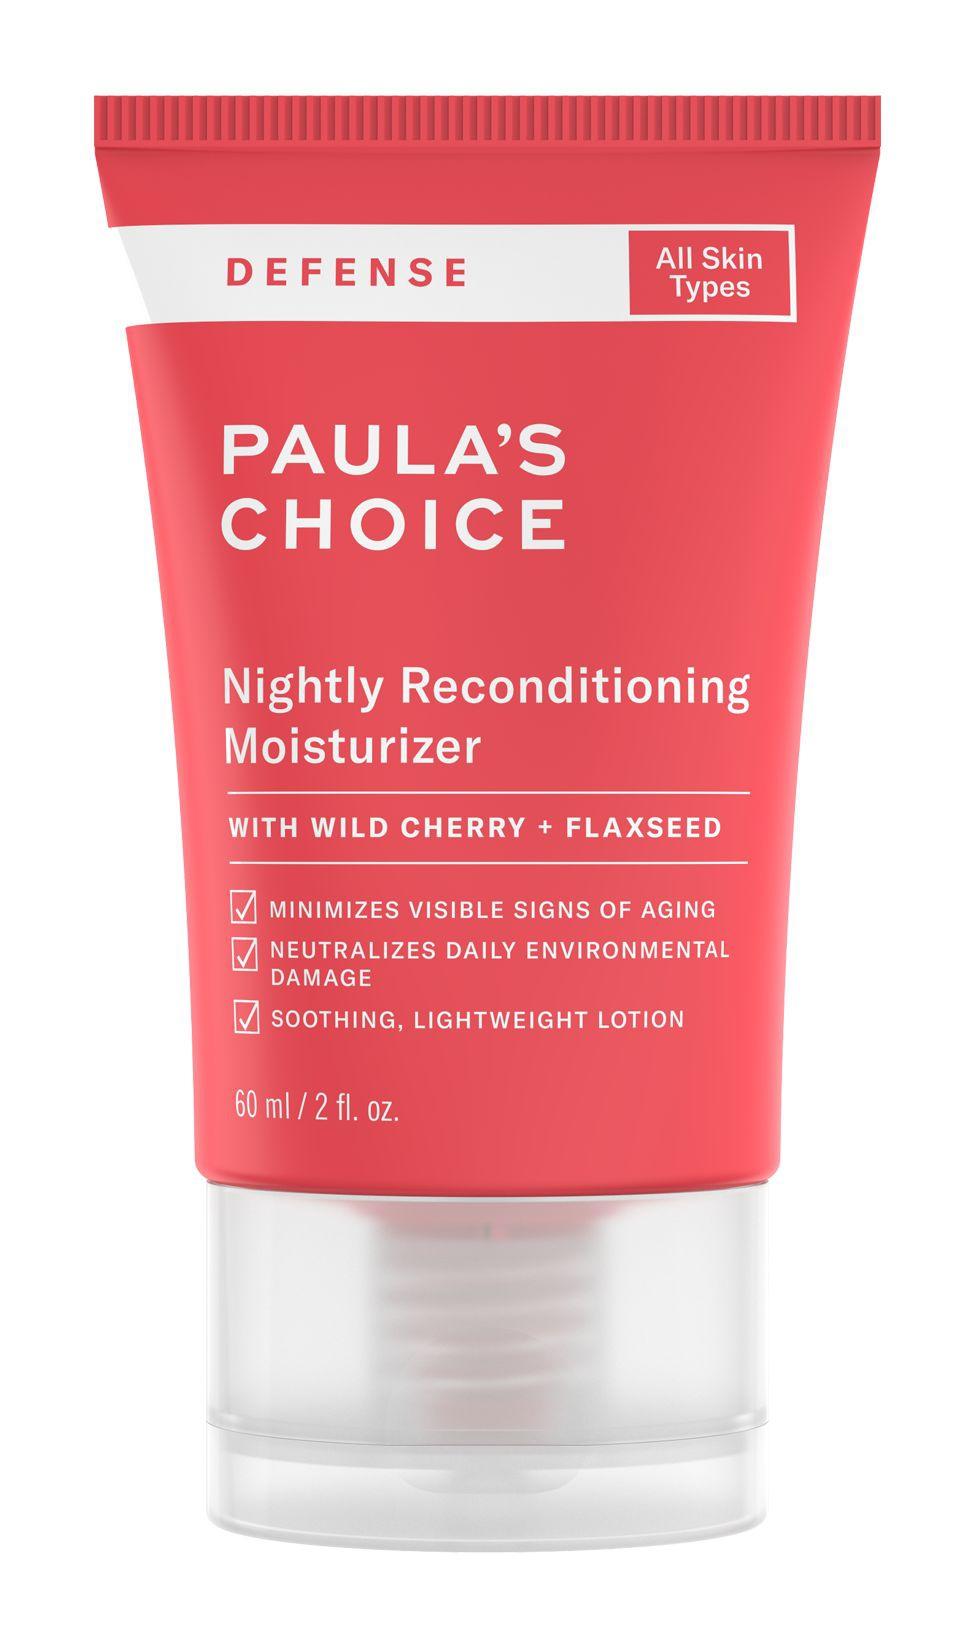 Paula's Choice Defense Nightly Reconditioning Moisturizer